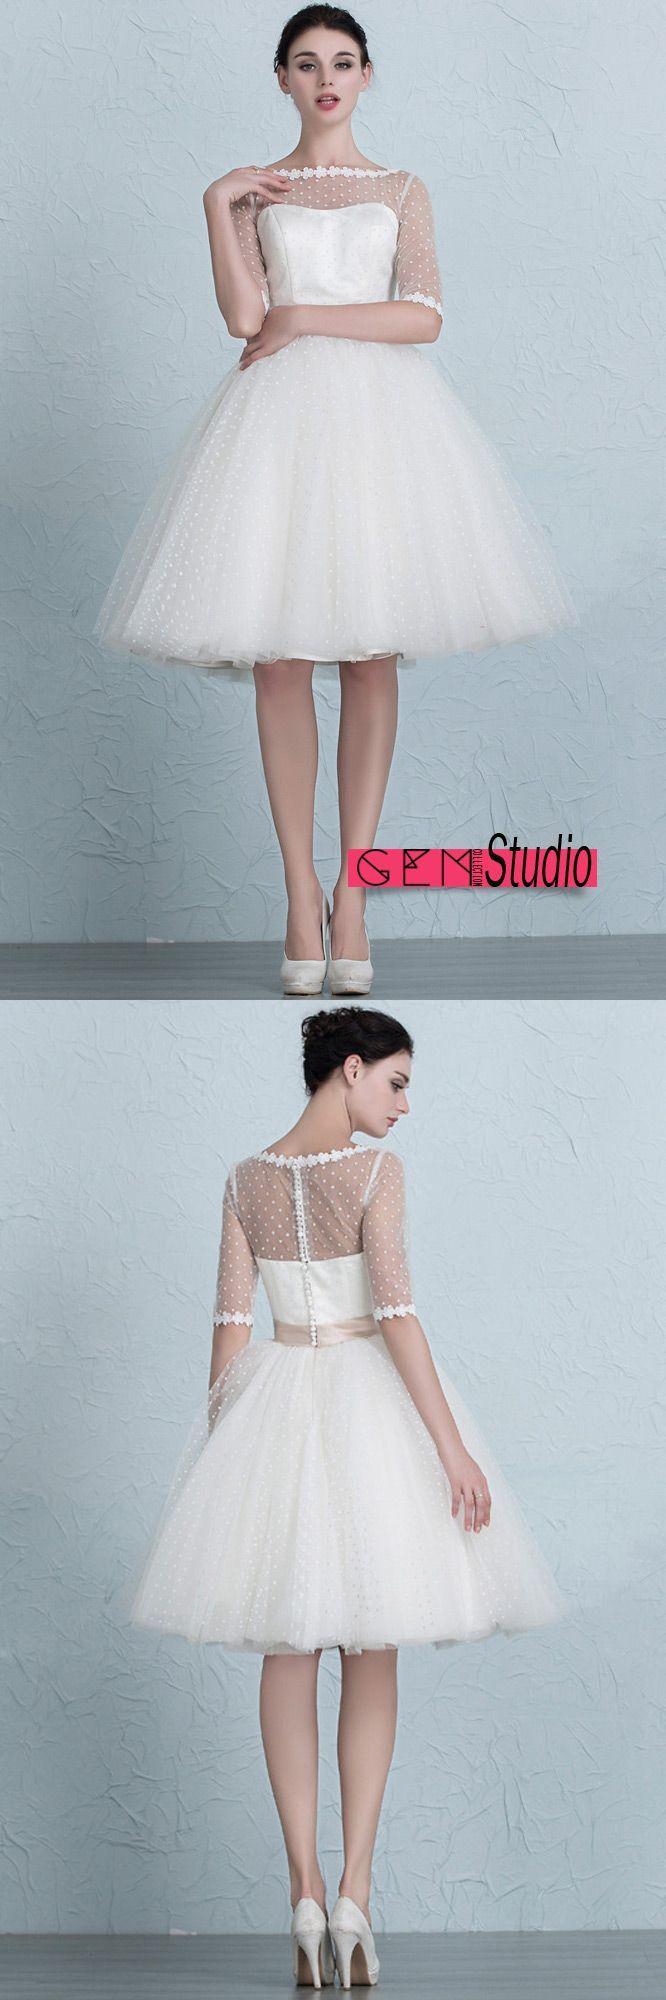 Vintage Short Wedding Dresses Polka Dot Knee Length Tulle Style with ...